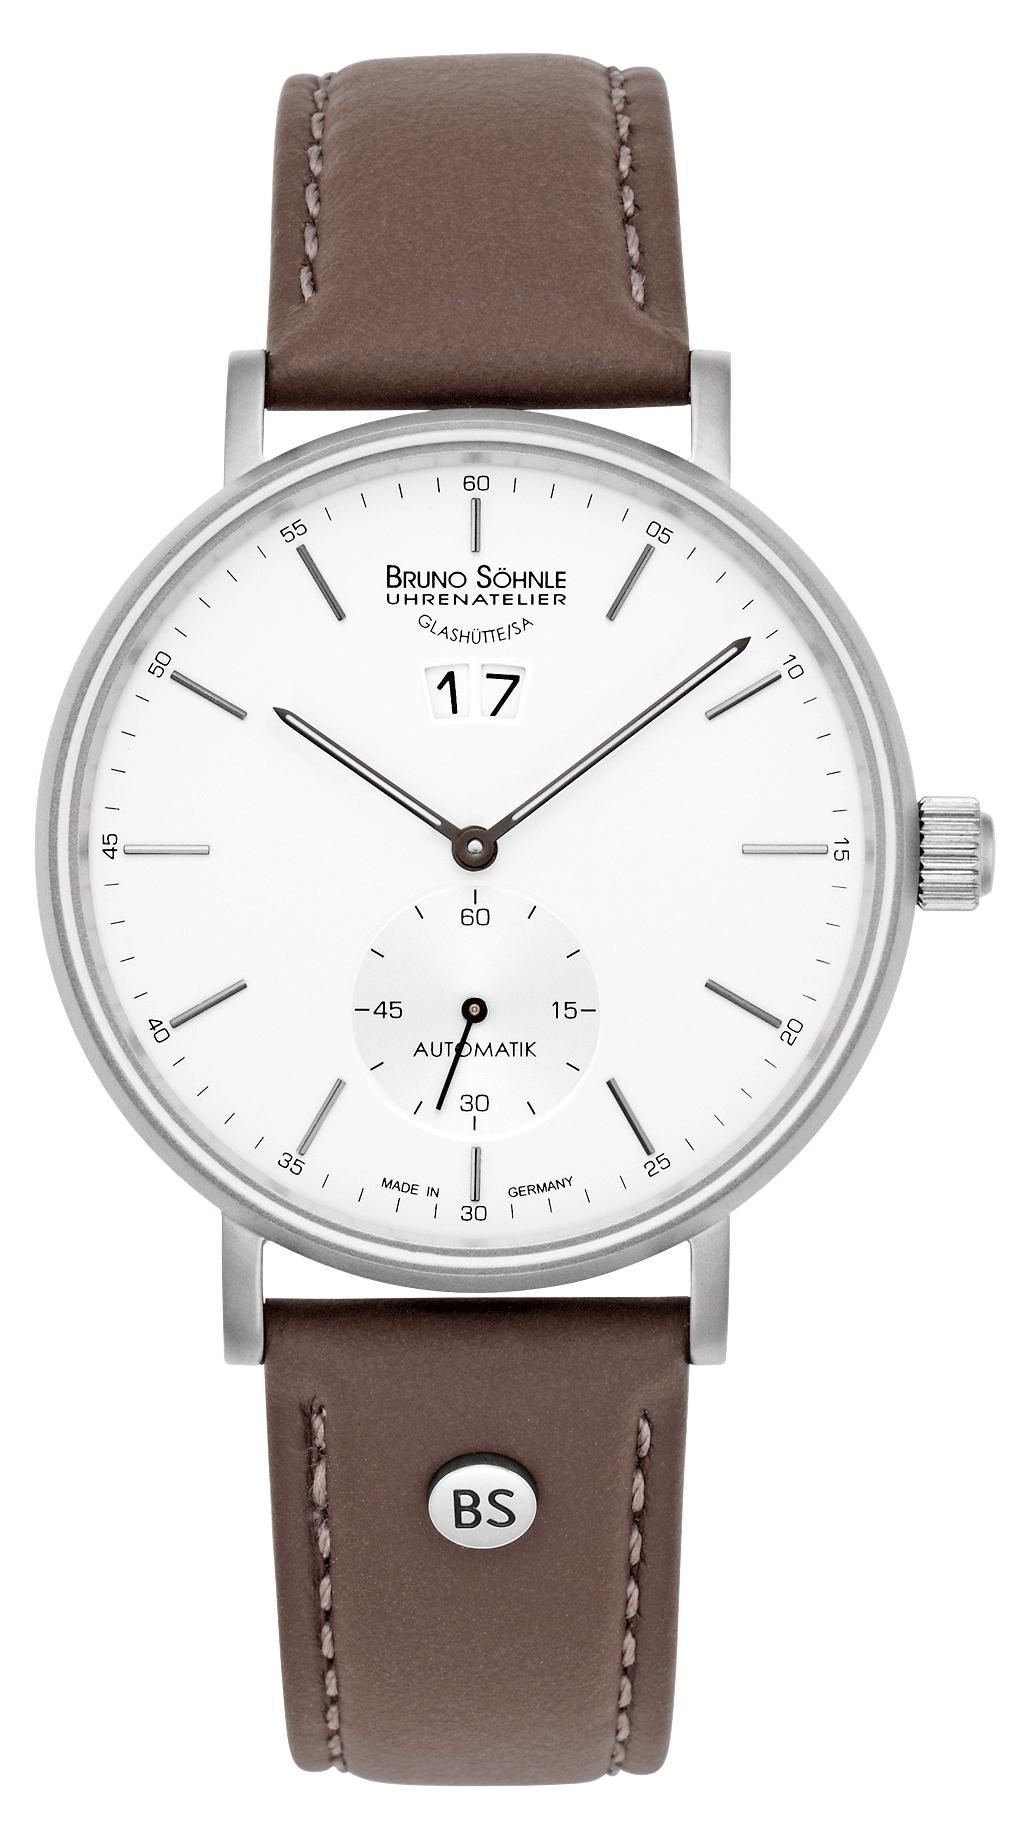 Bruno Söhnle horloge – Frankfurt – 17-12193-841